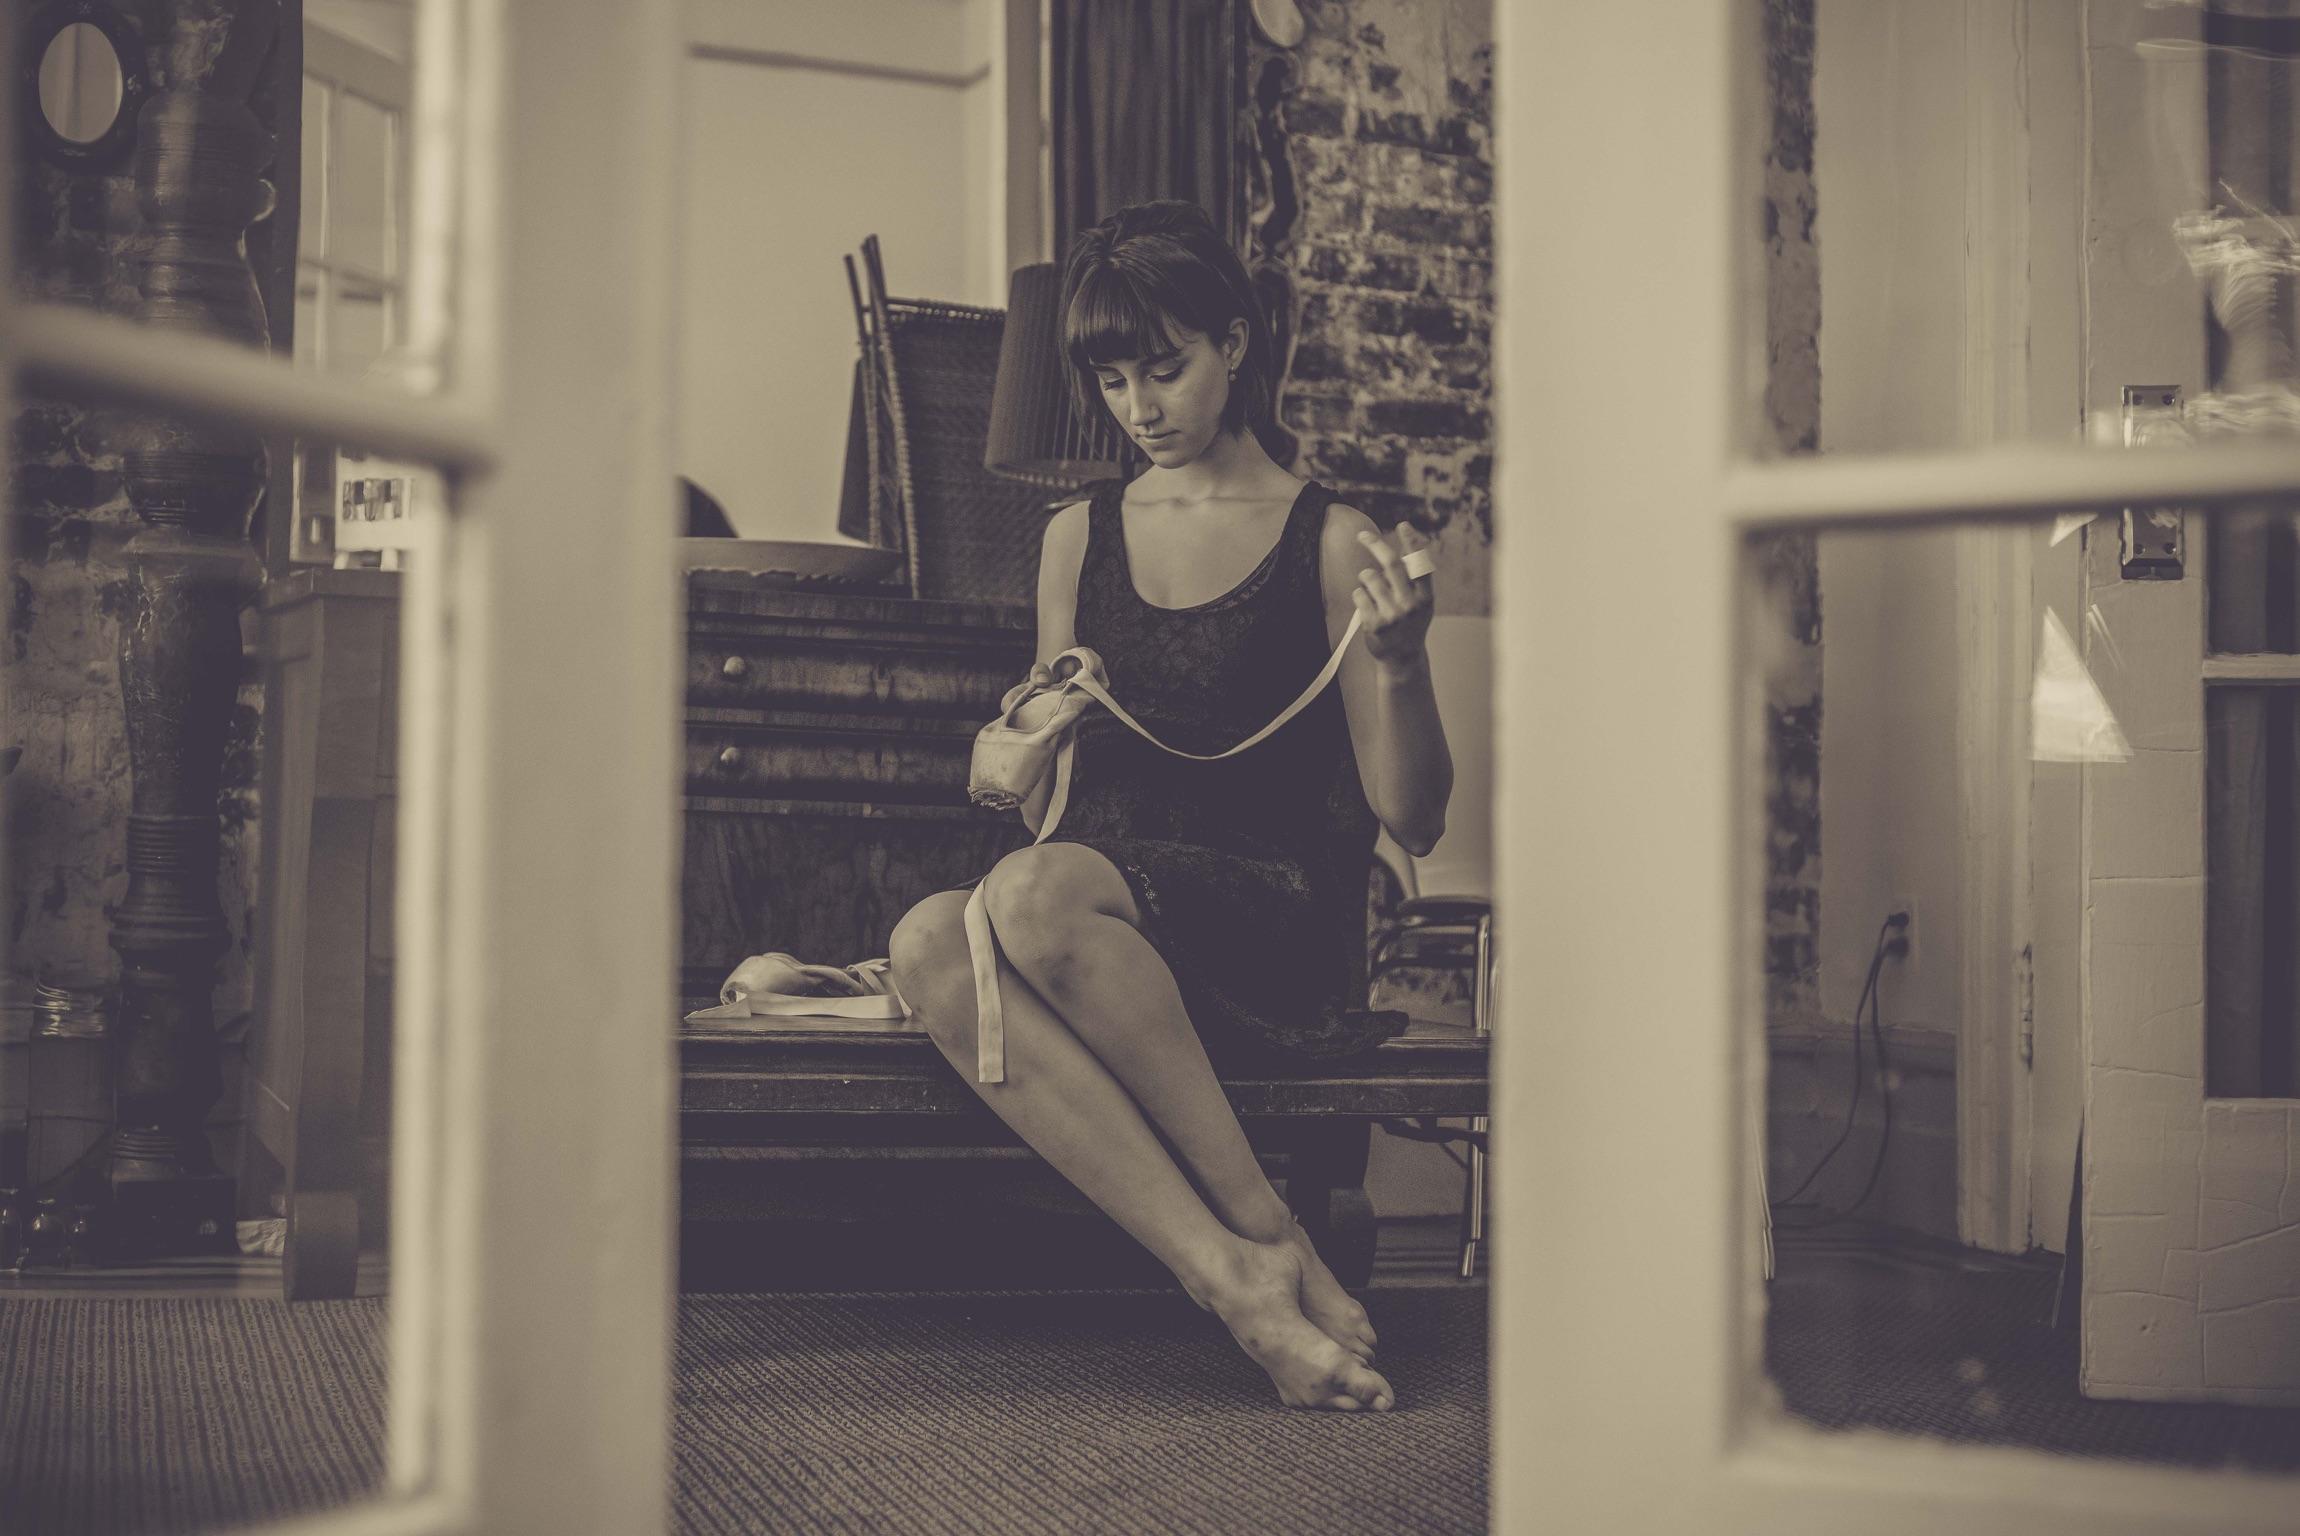 Photo by Adrian McDonald